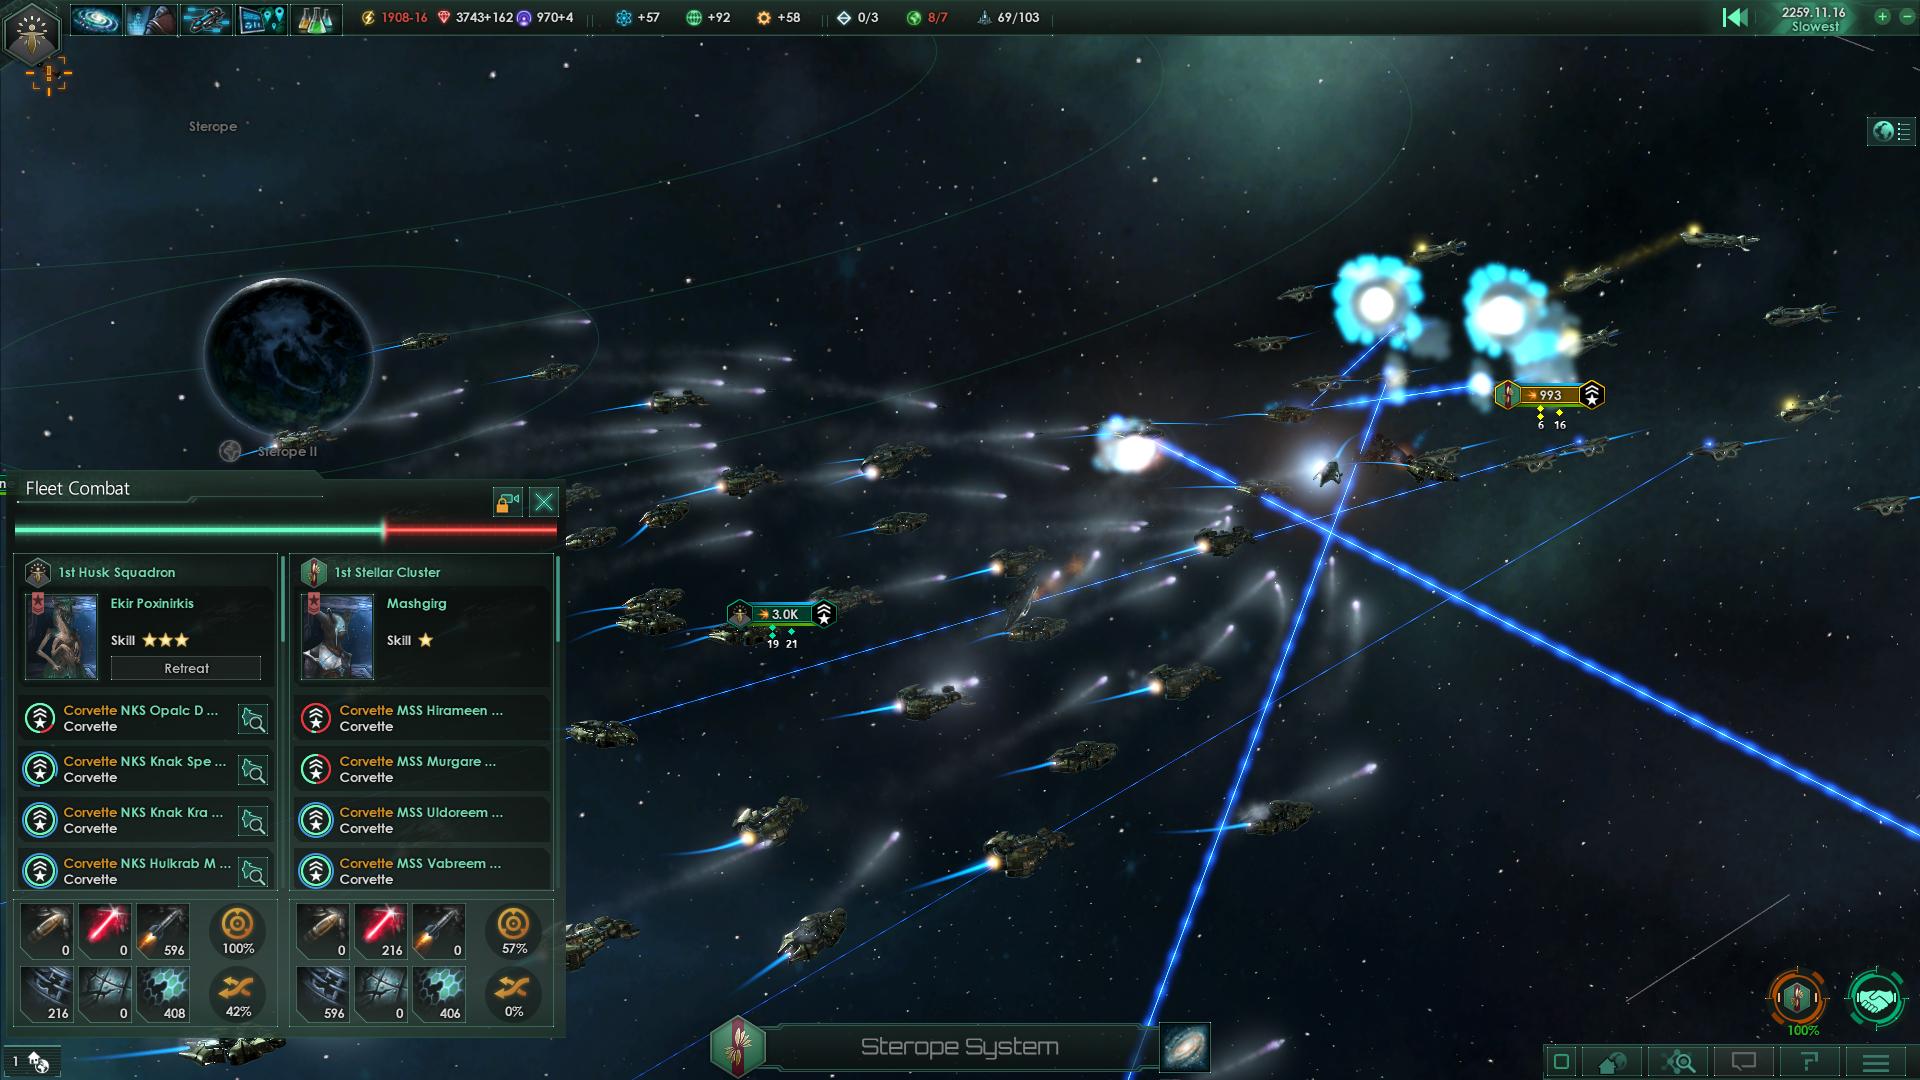 Stellaris Battle Screenshot 2